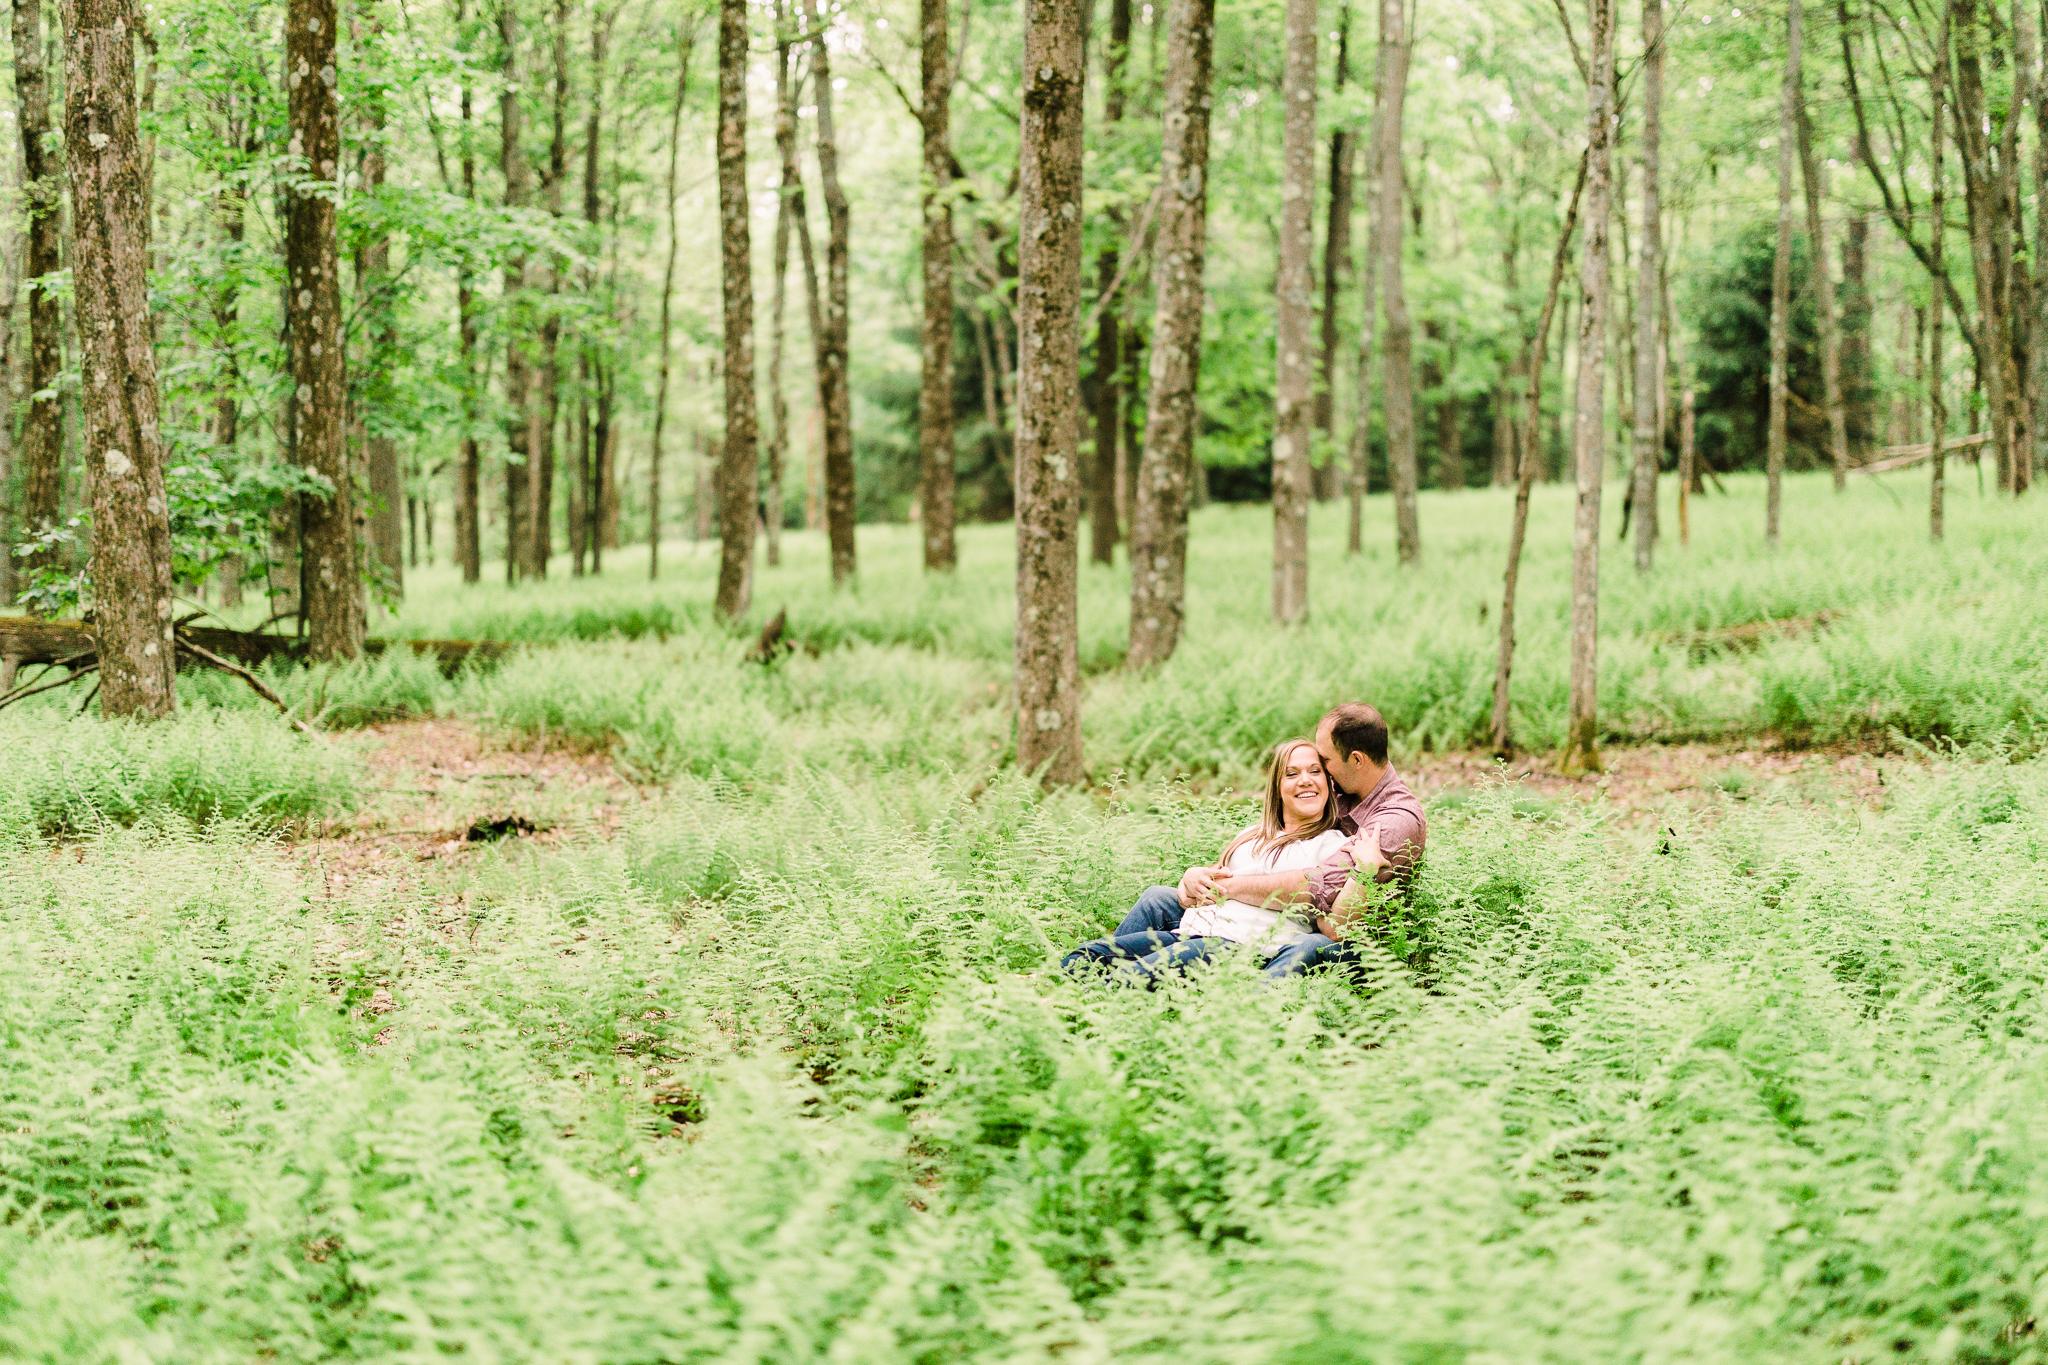 Kettle-creek-state-park-engagement-9314.jpg